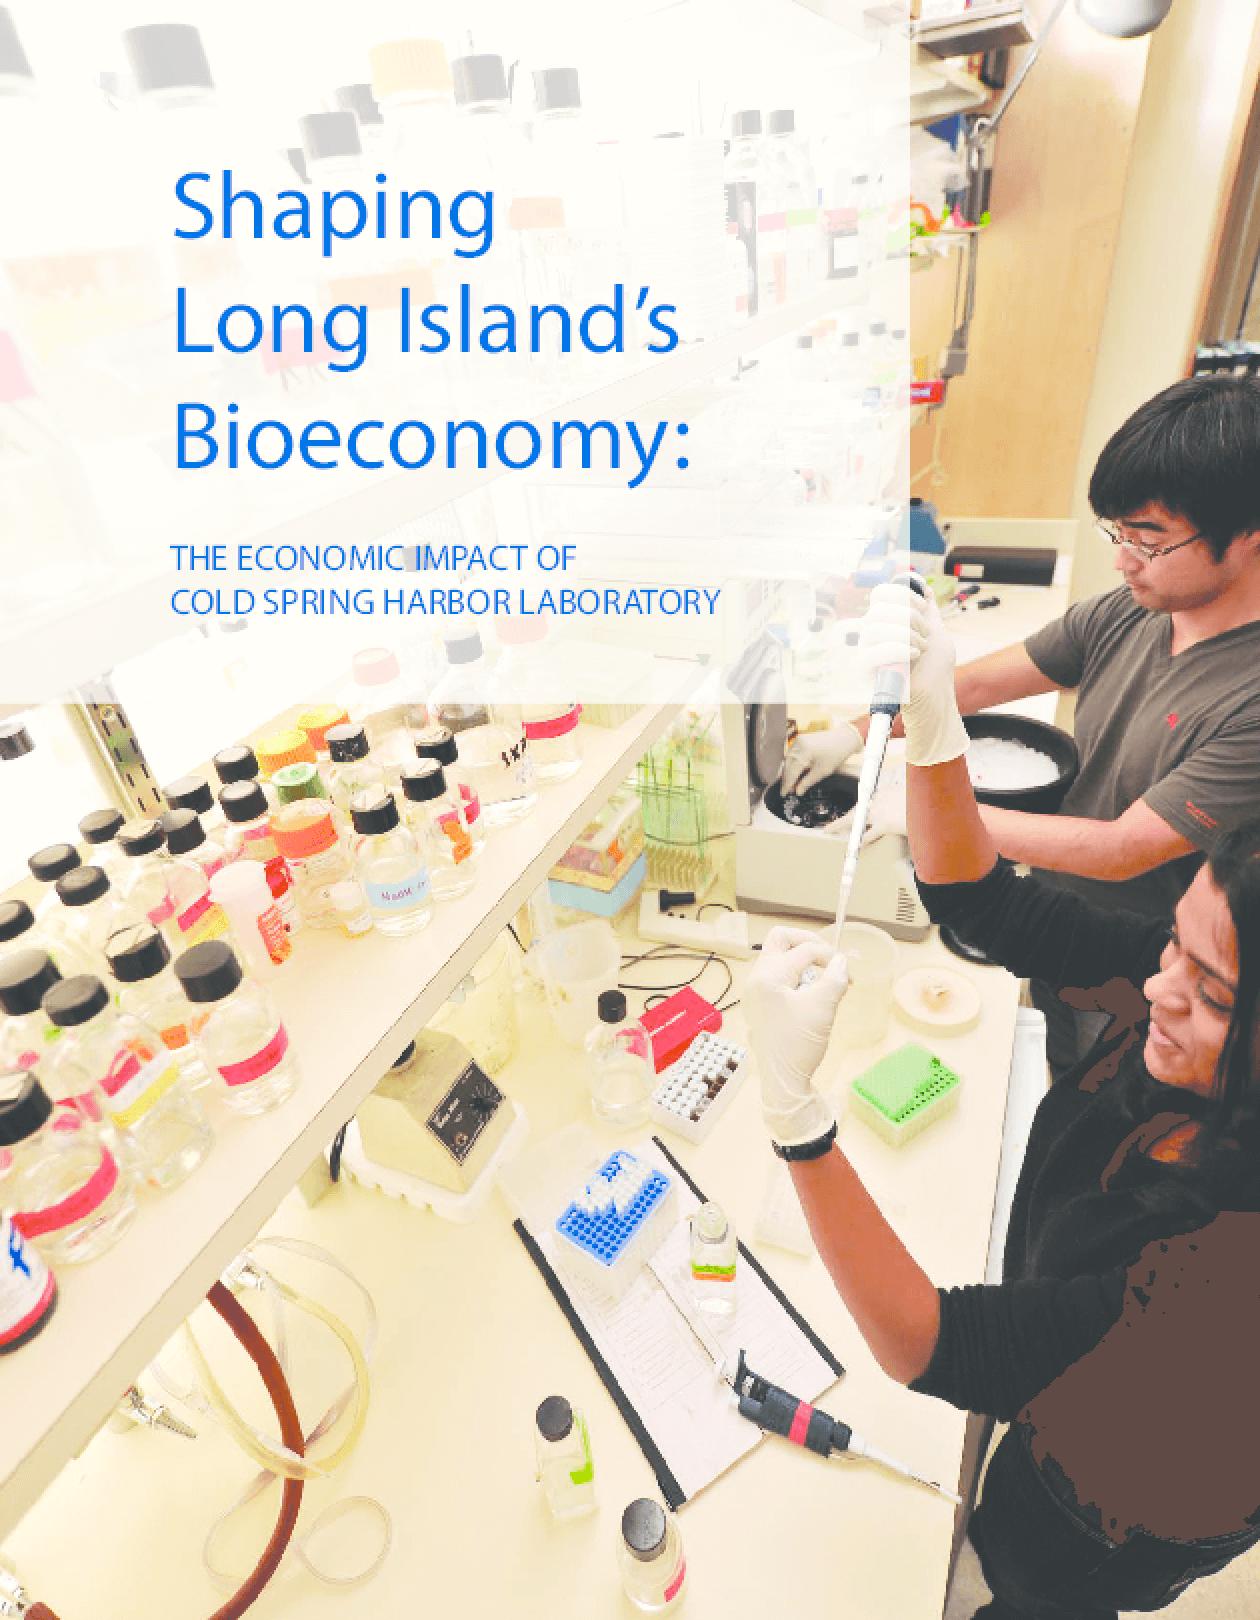 Shaping Long Island's Bioeconomy: The Economic Impact of Cold Spring Harbor Laboratory